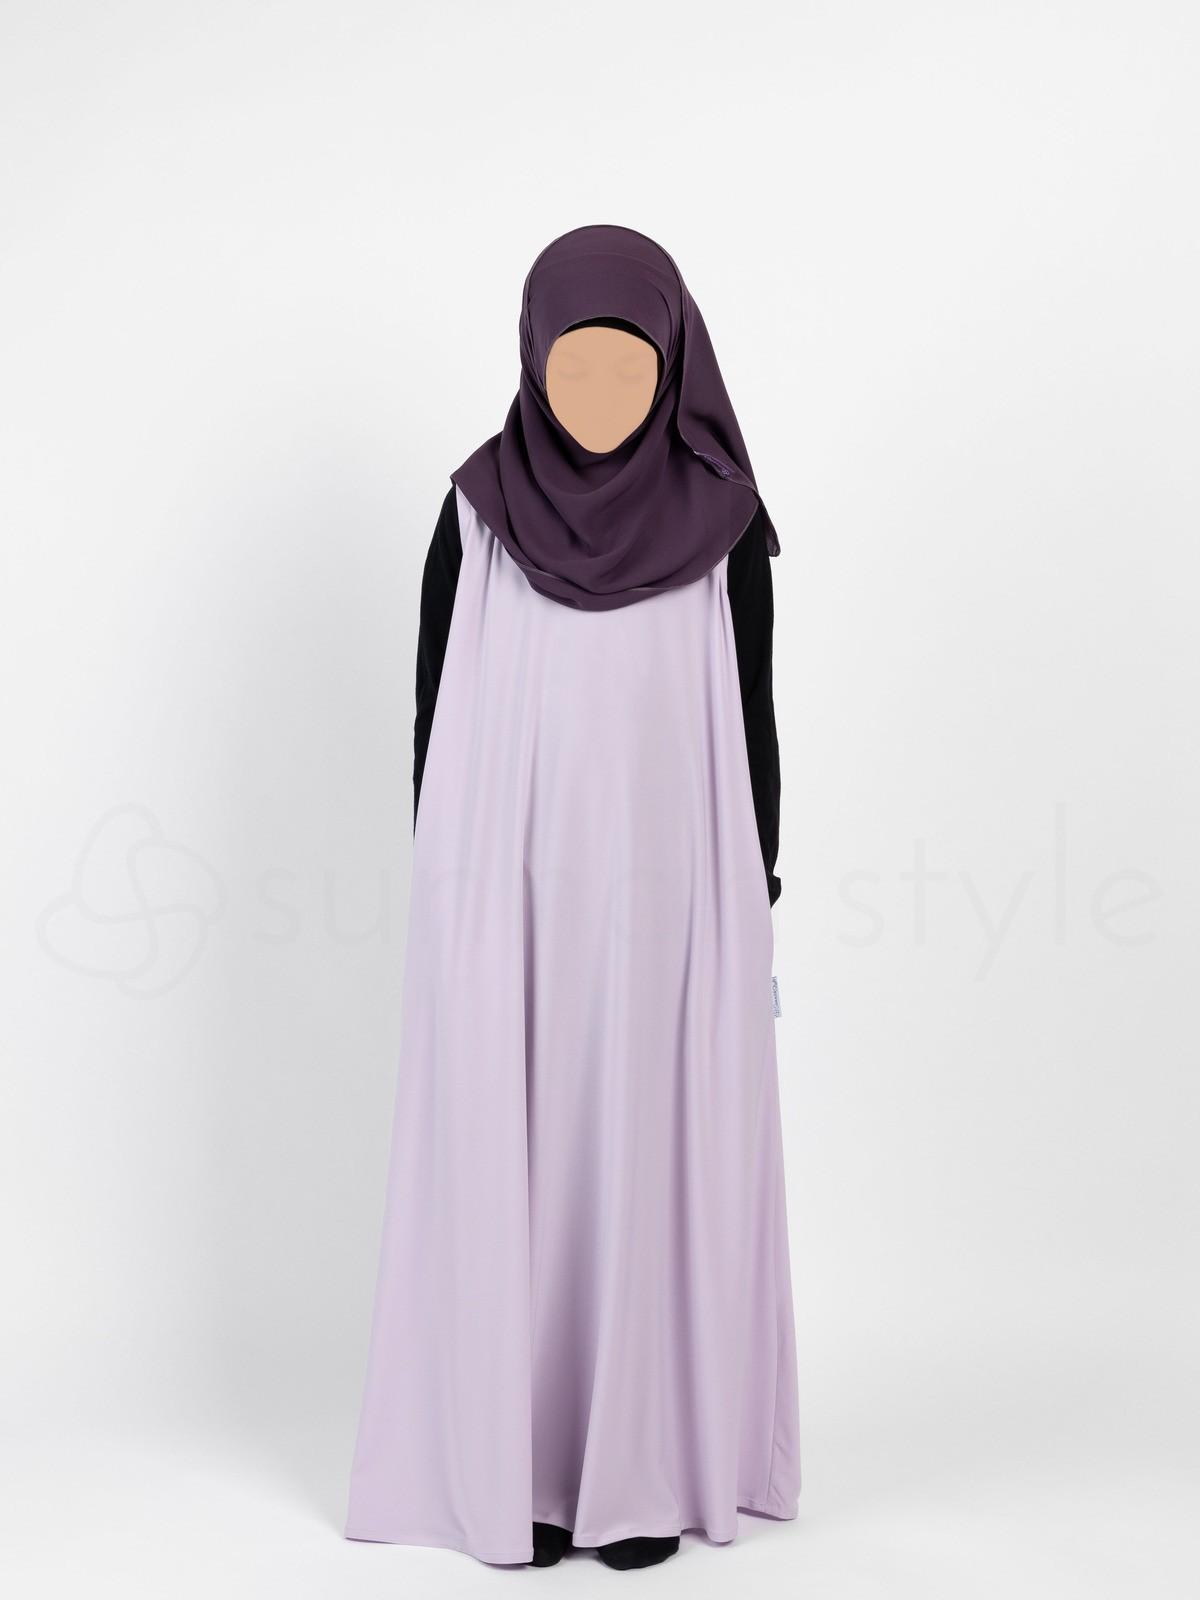 Sunnah Style - Girls Sleeveless Jersey Abaya (Lavender)